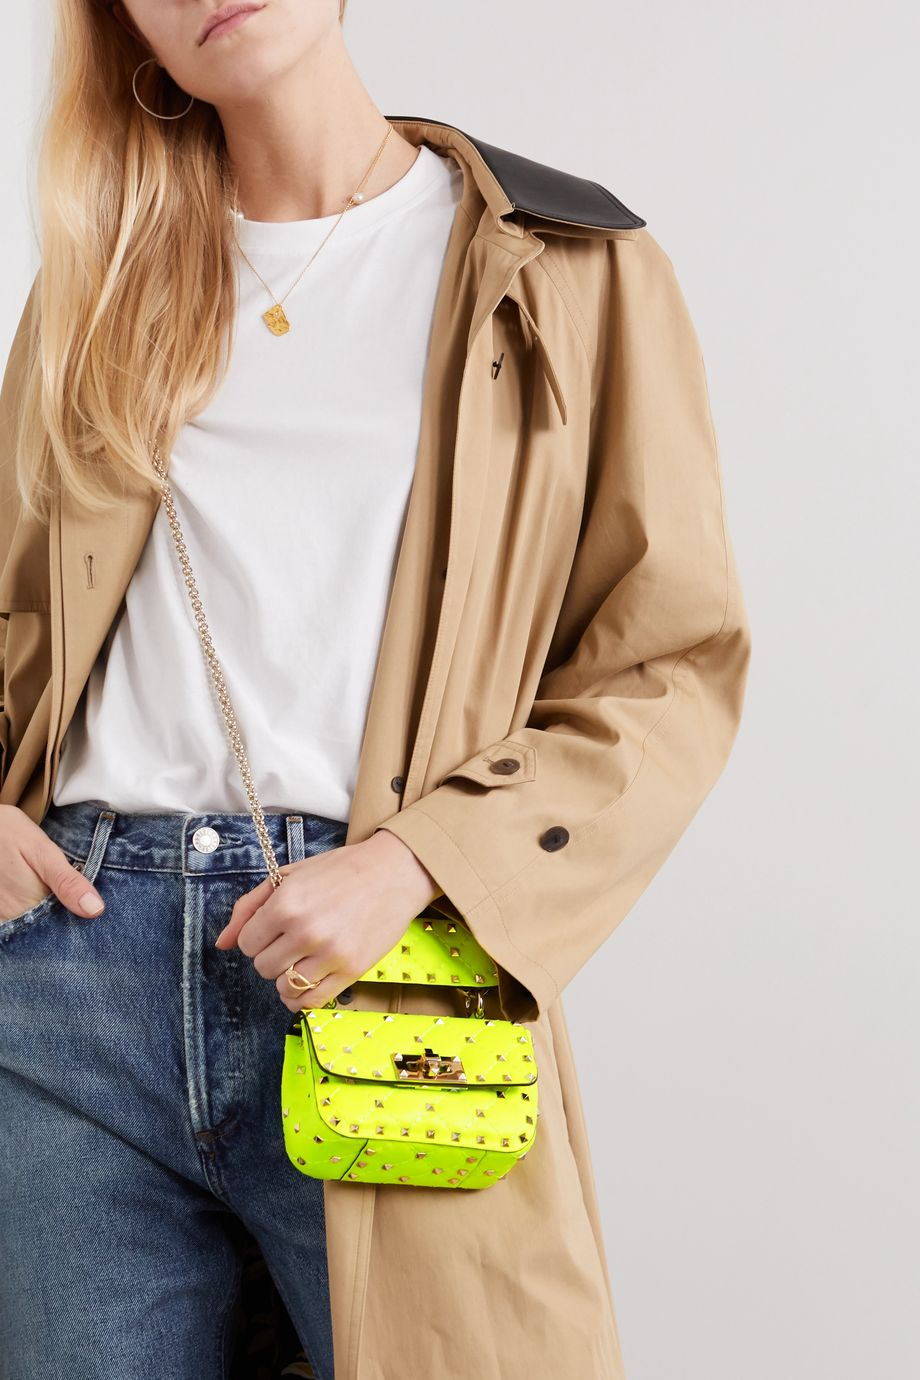 Valentino Valentino Garavani Rockstud Spike micro quilted neon leather shoulder bag